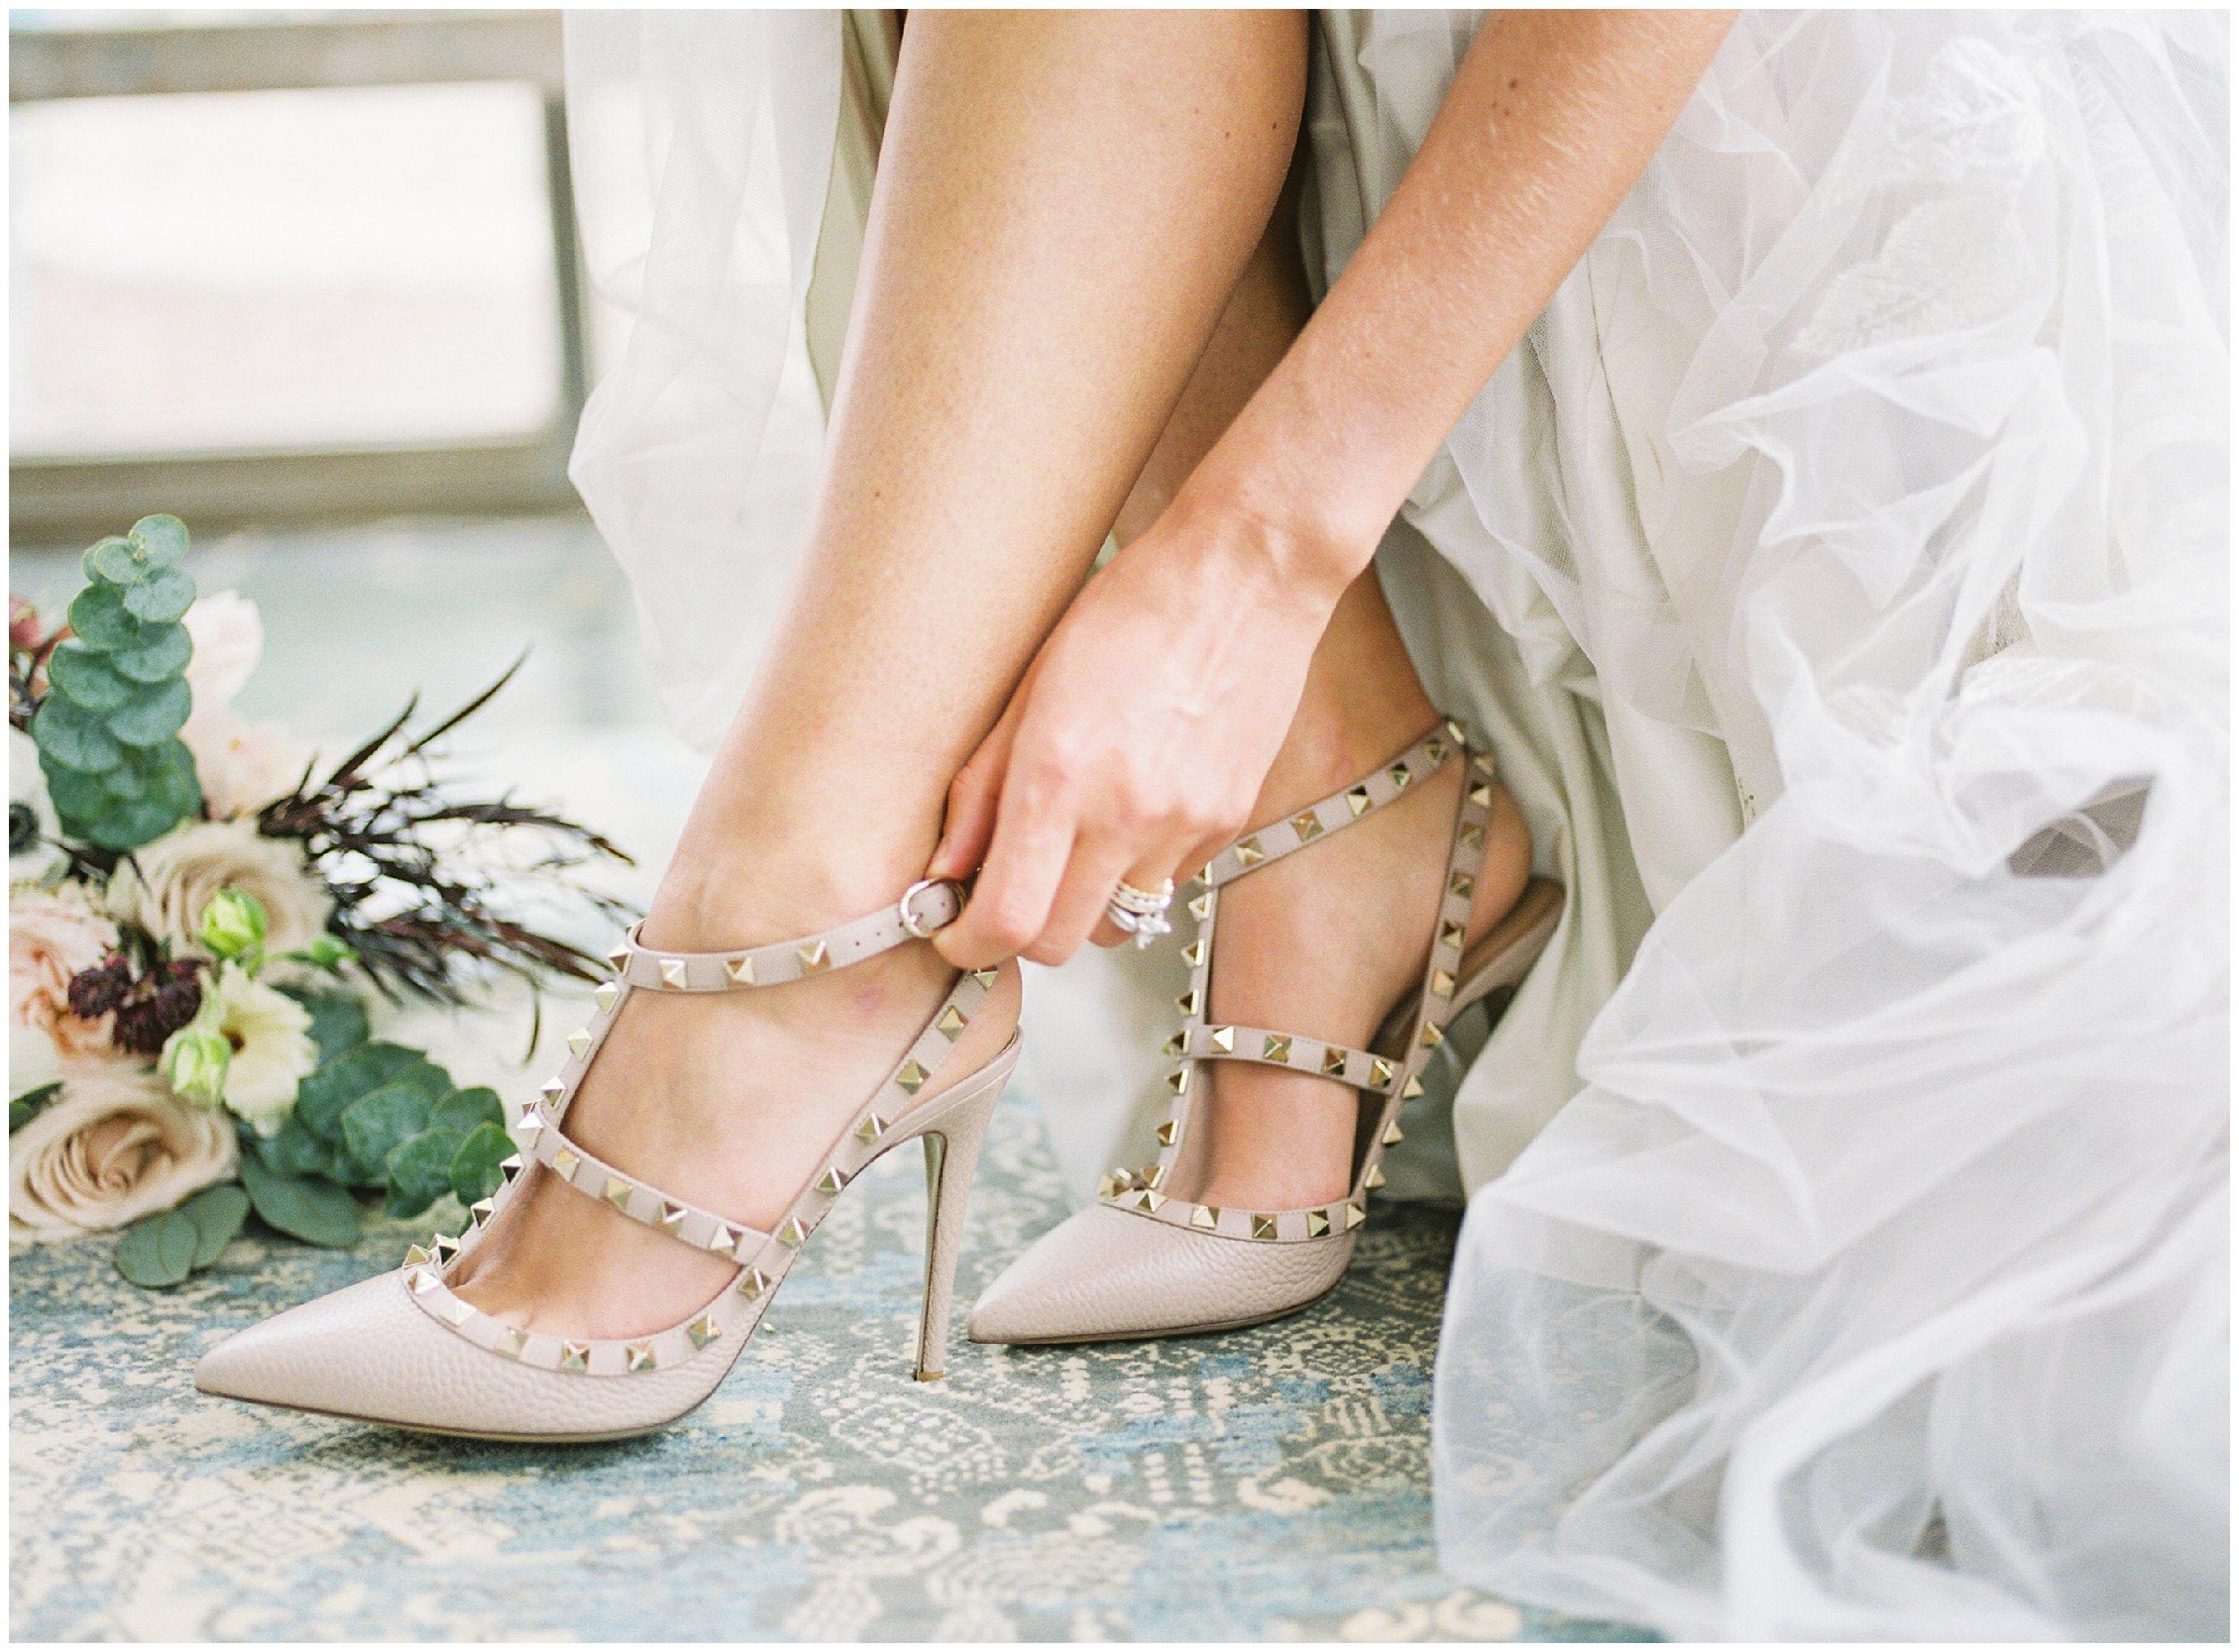 charlotte wedding details, bride putting on shoes